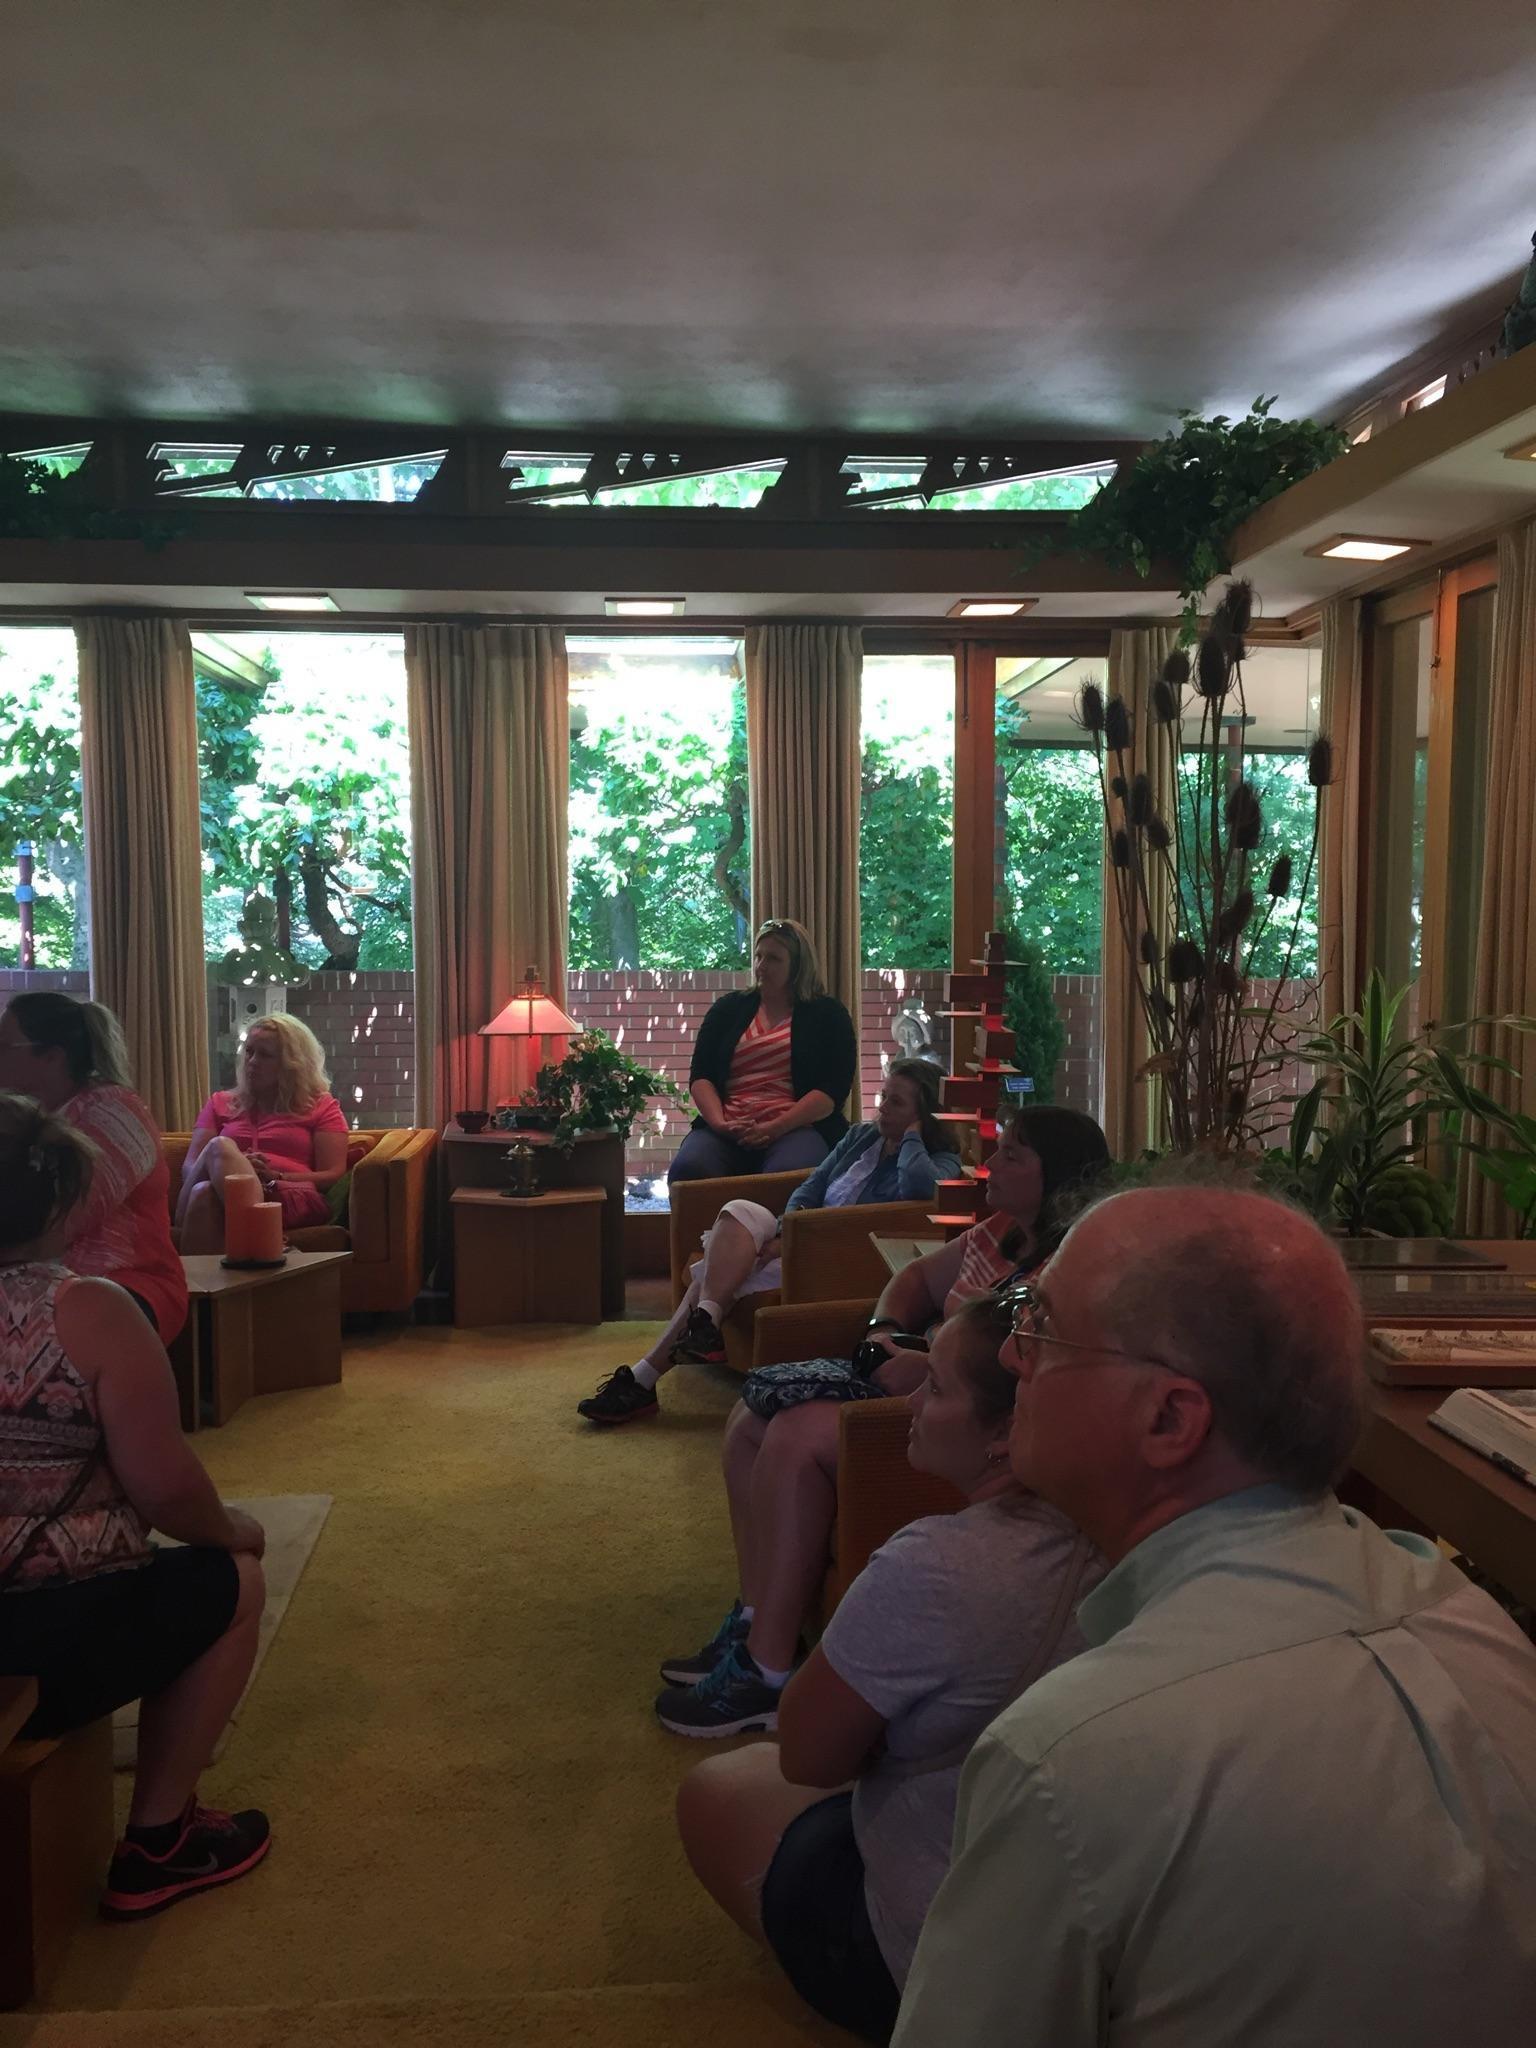 Visiting Samara House designed by Frank Lloyd Wright